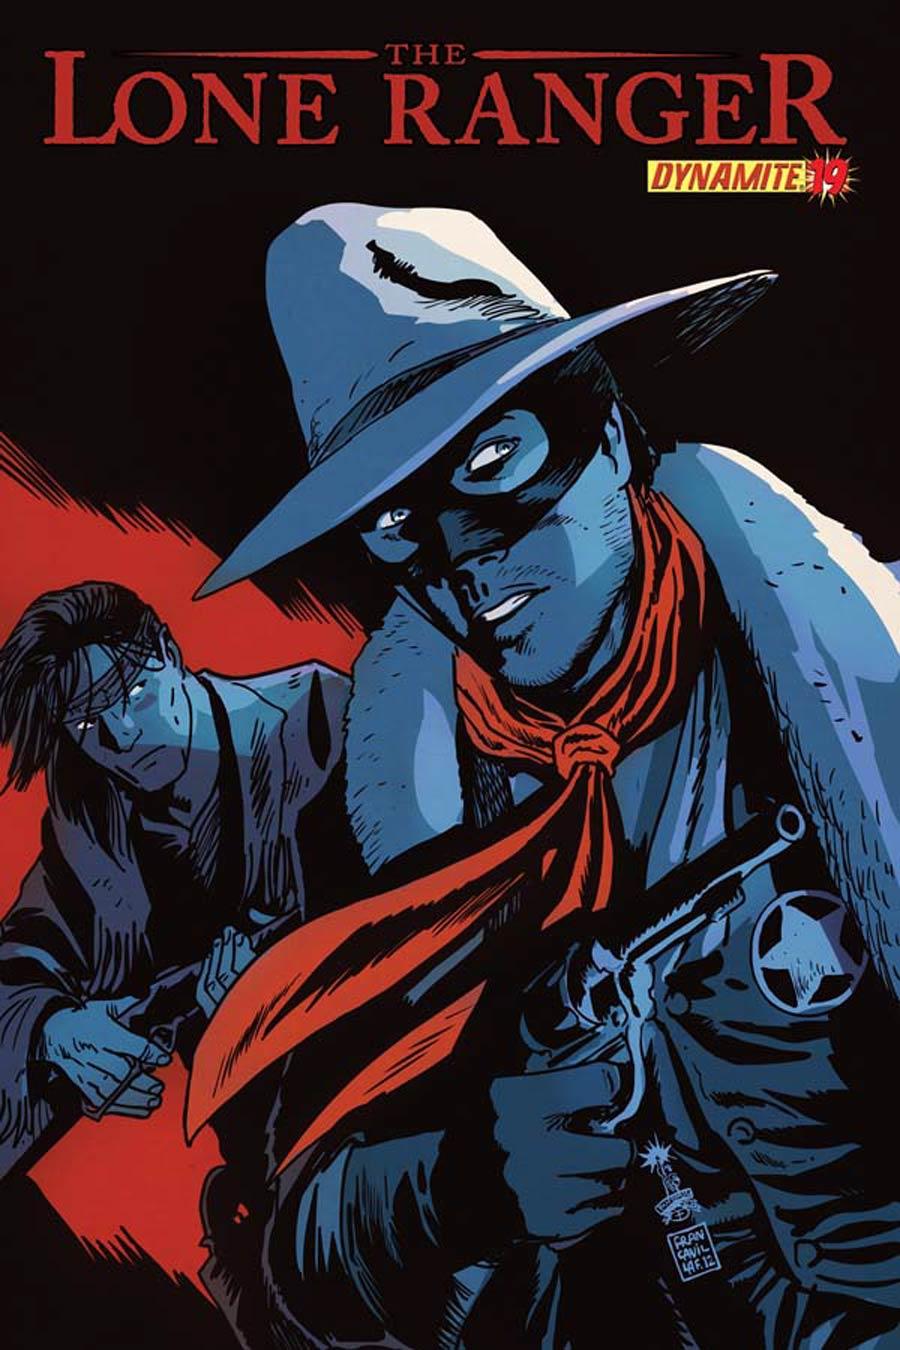 Lone Ranger Vol 5 #19